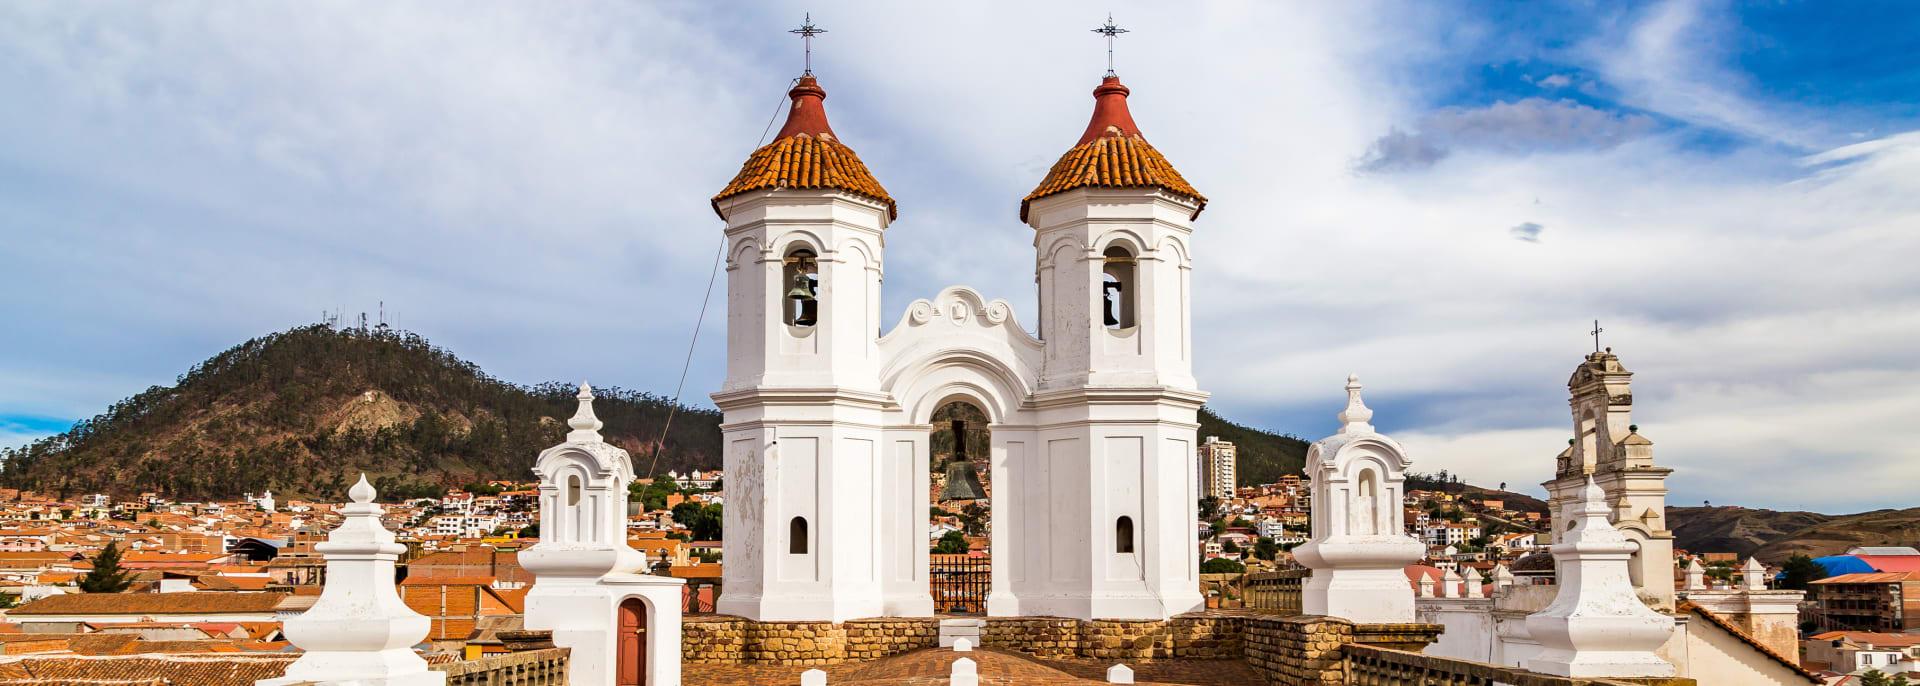 Sucre, Bolivien